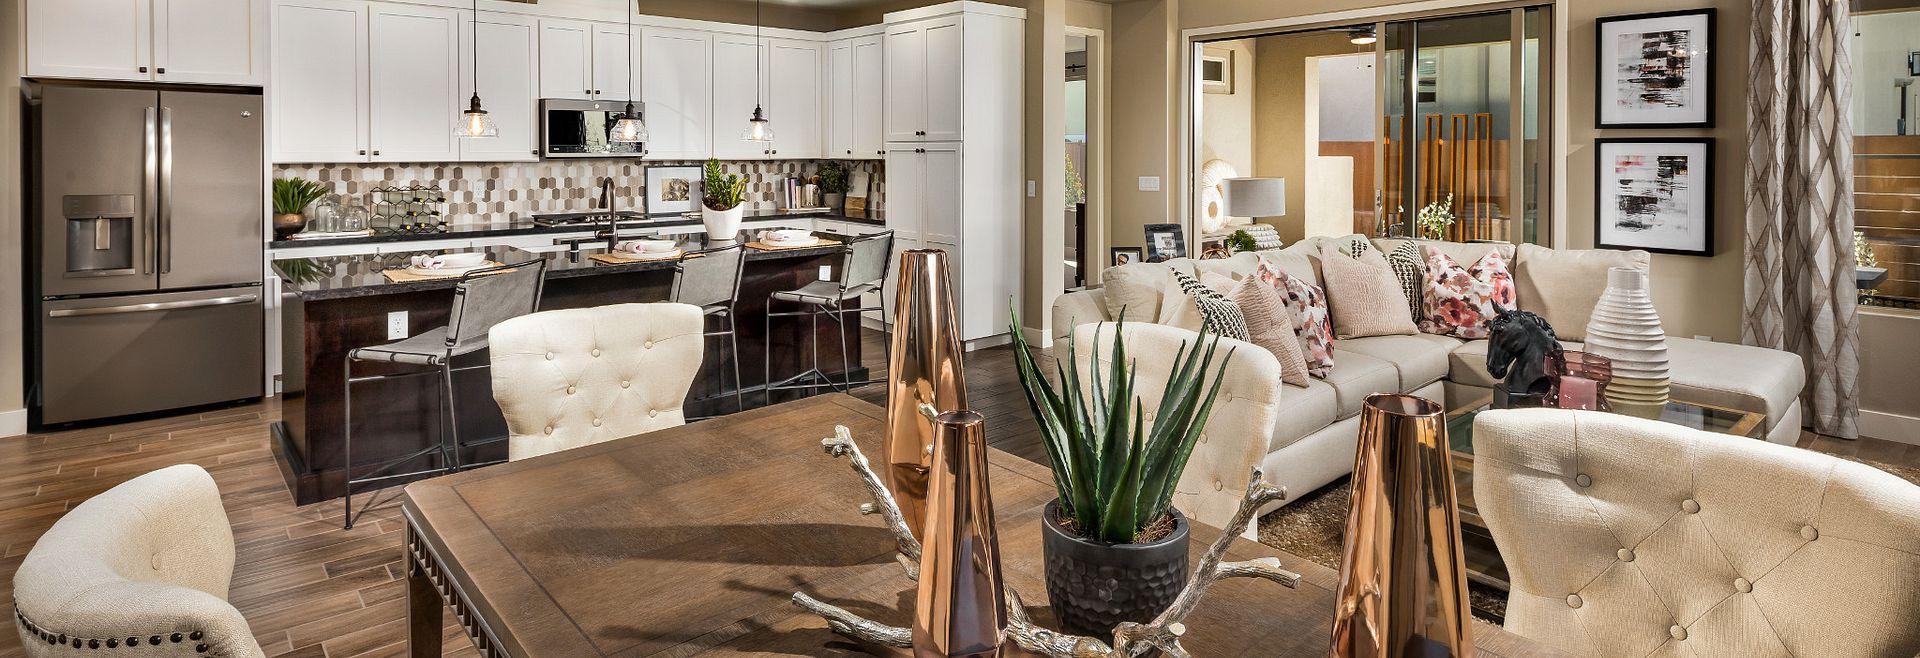 Retreat Plan Great Room